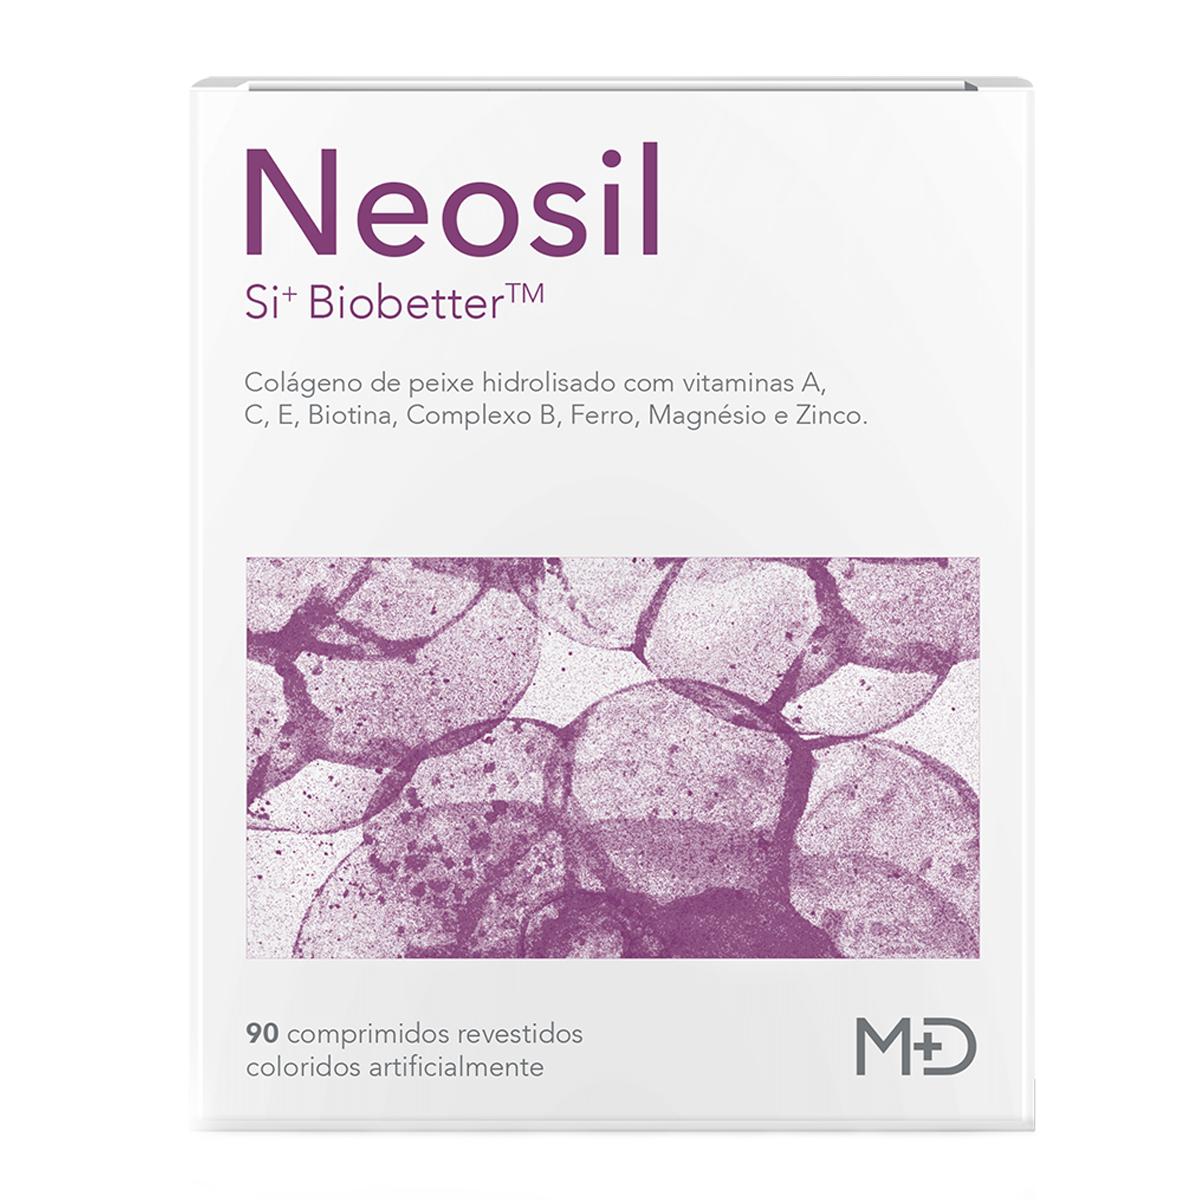 Neosil 50mg Suplemento Alimentar com 90 comprimidos Germed 90 Comprimidos Revestidos